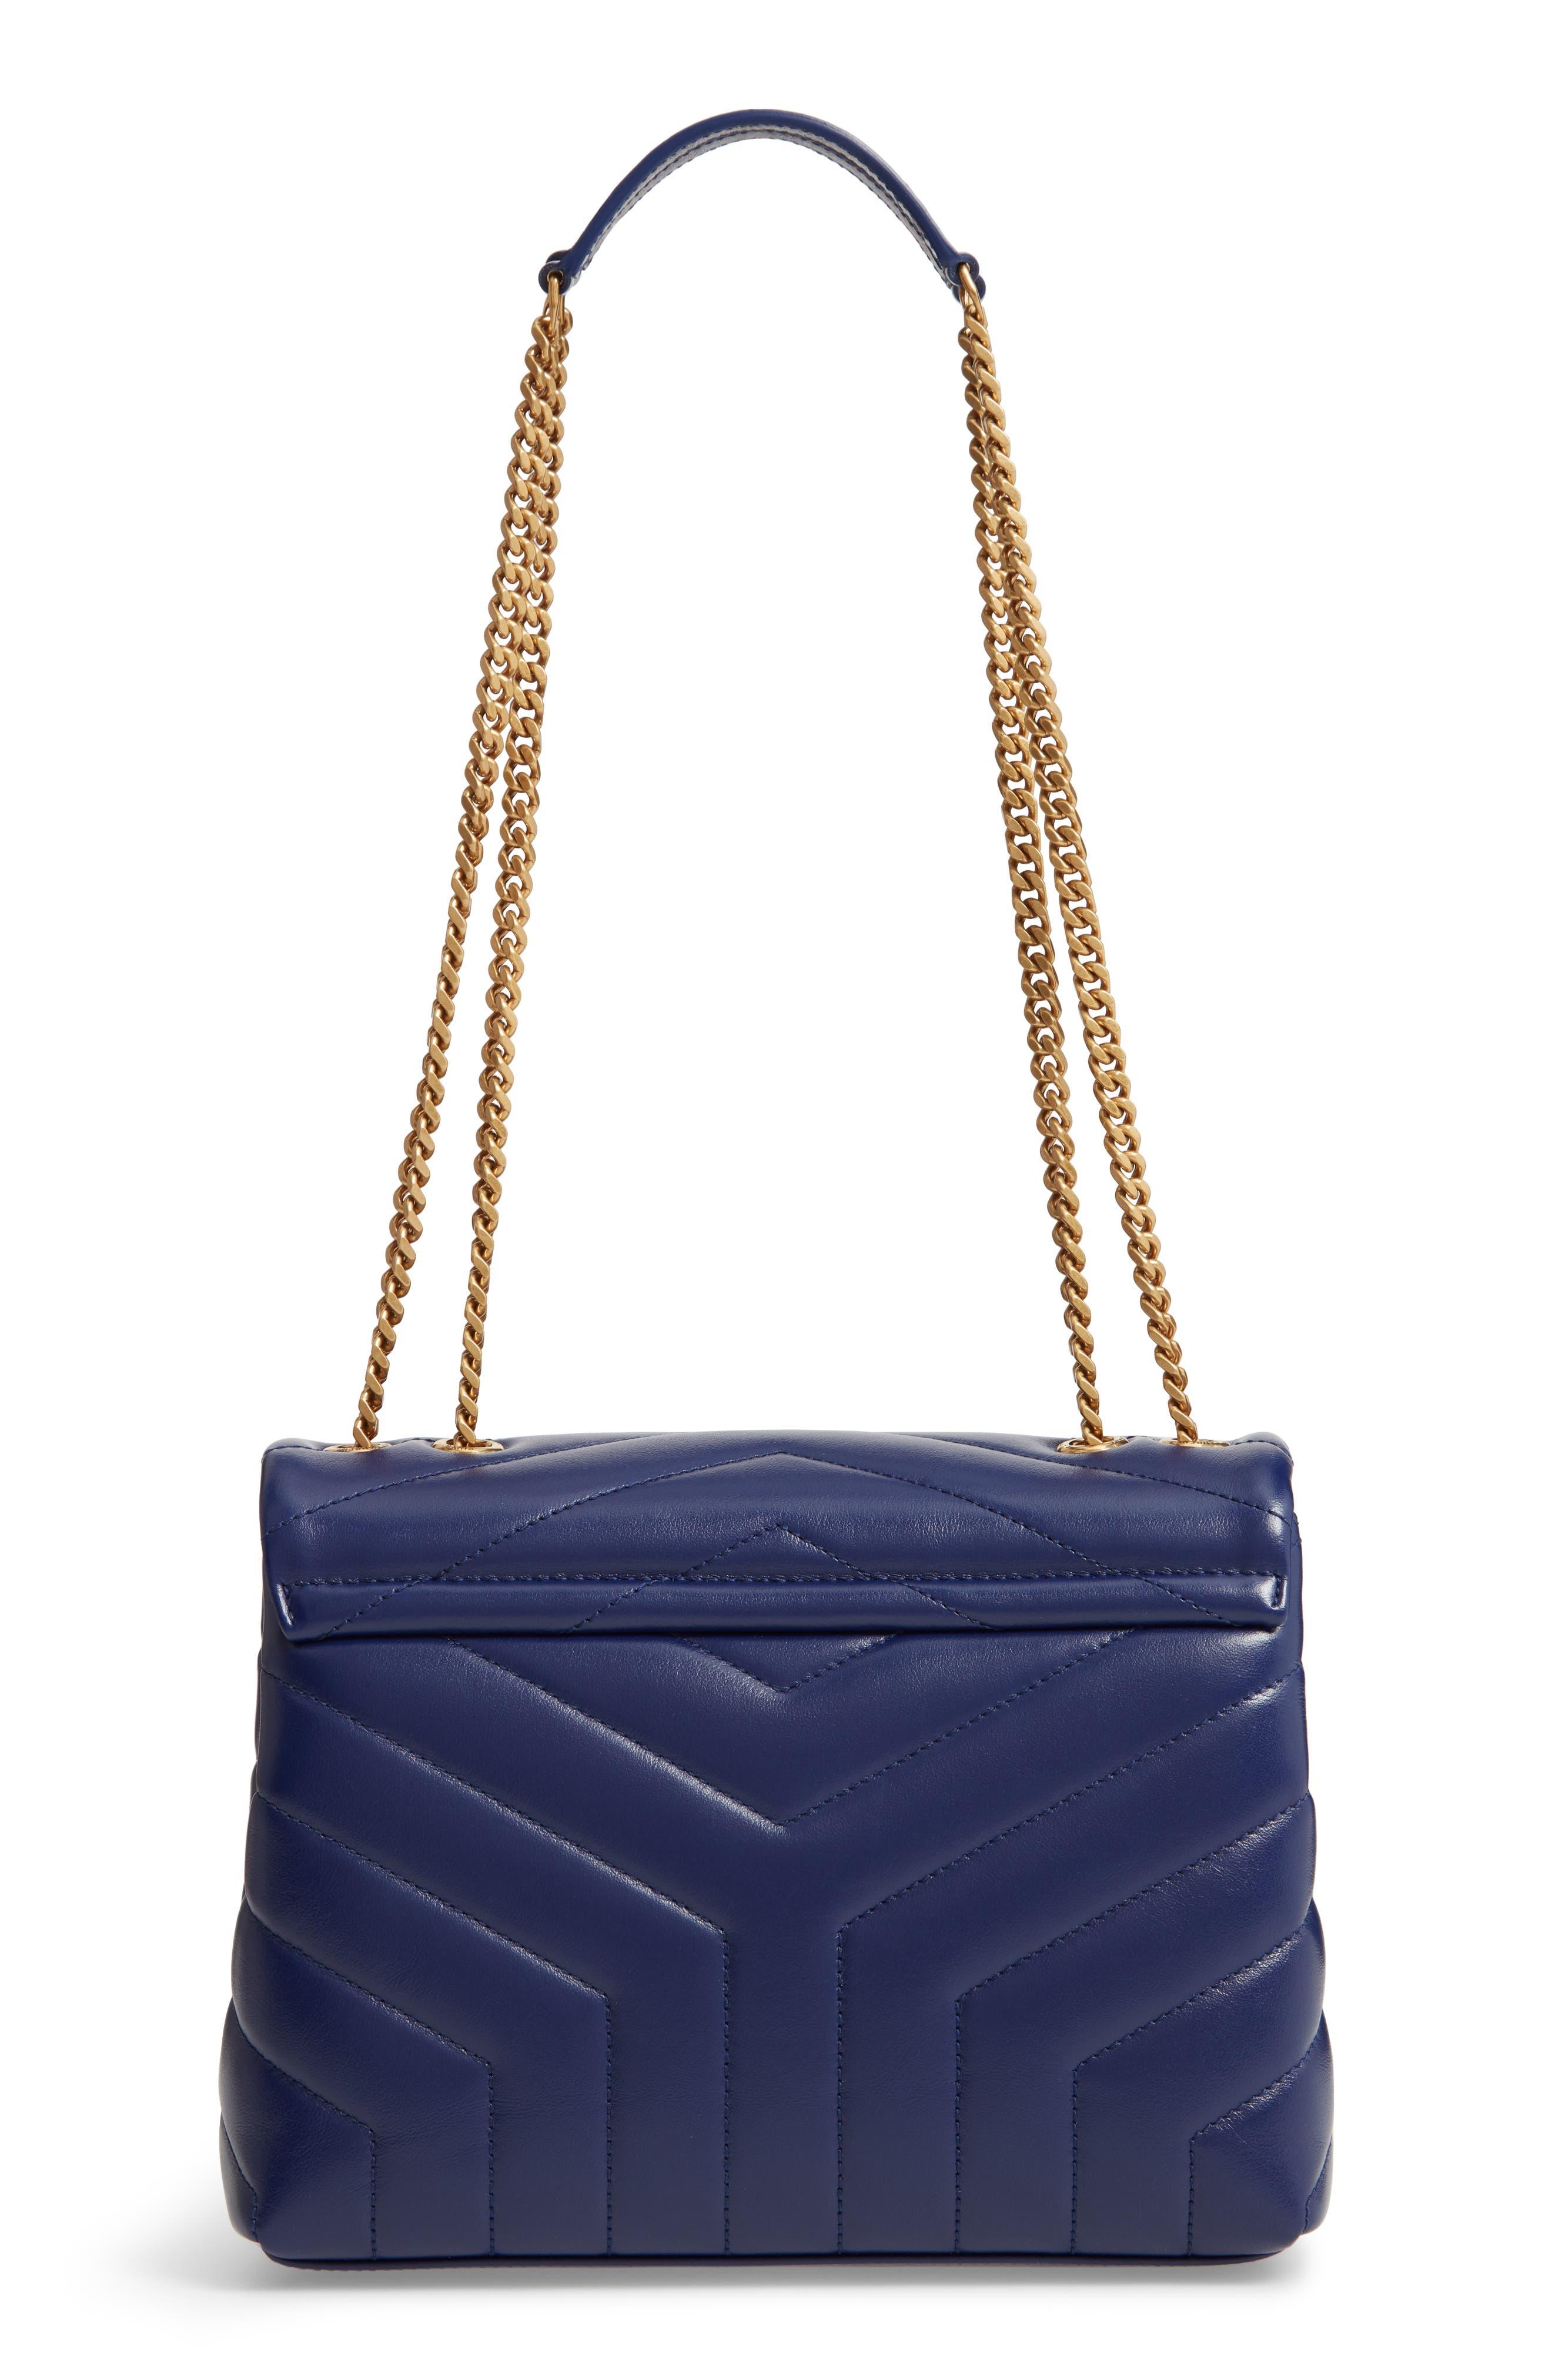 Small Loulou Leather Shoulder Bag,                             Alternate thumbnail 3, color,                             SAPHIR